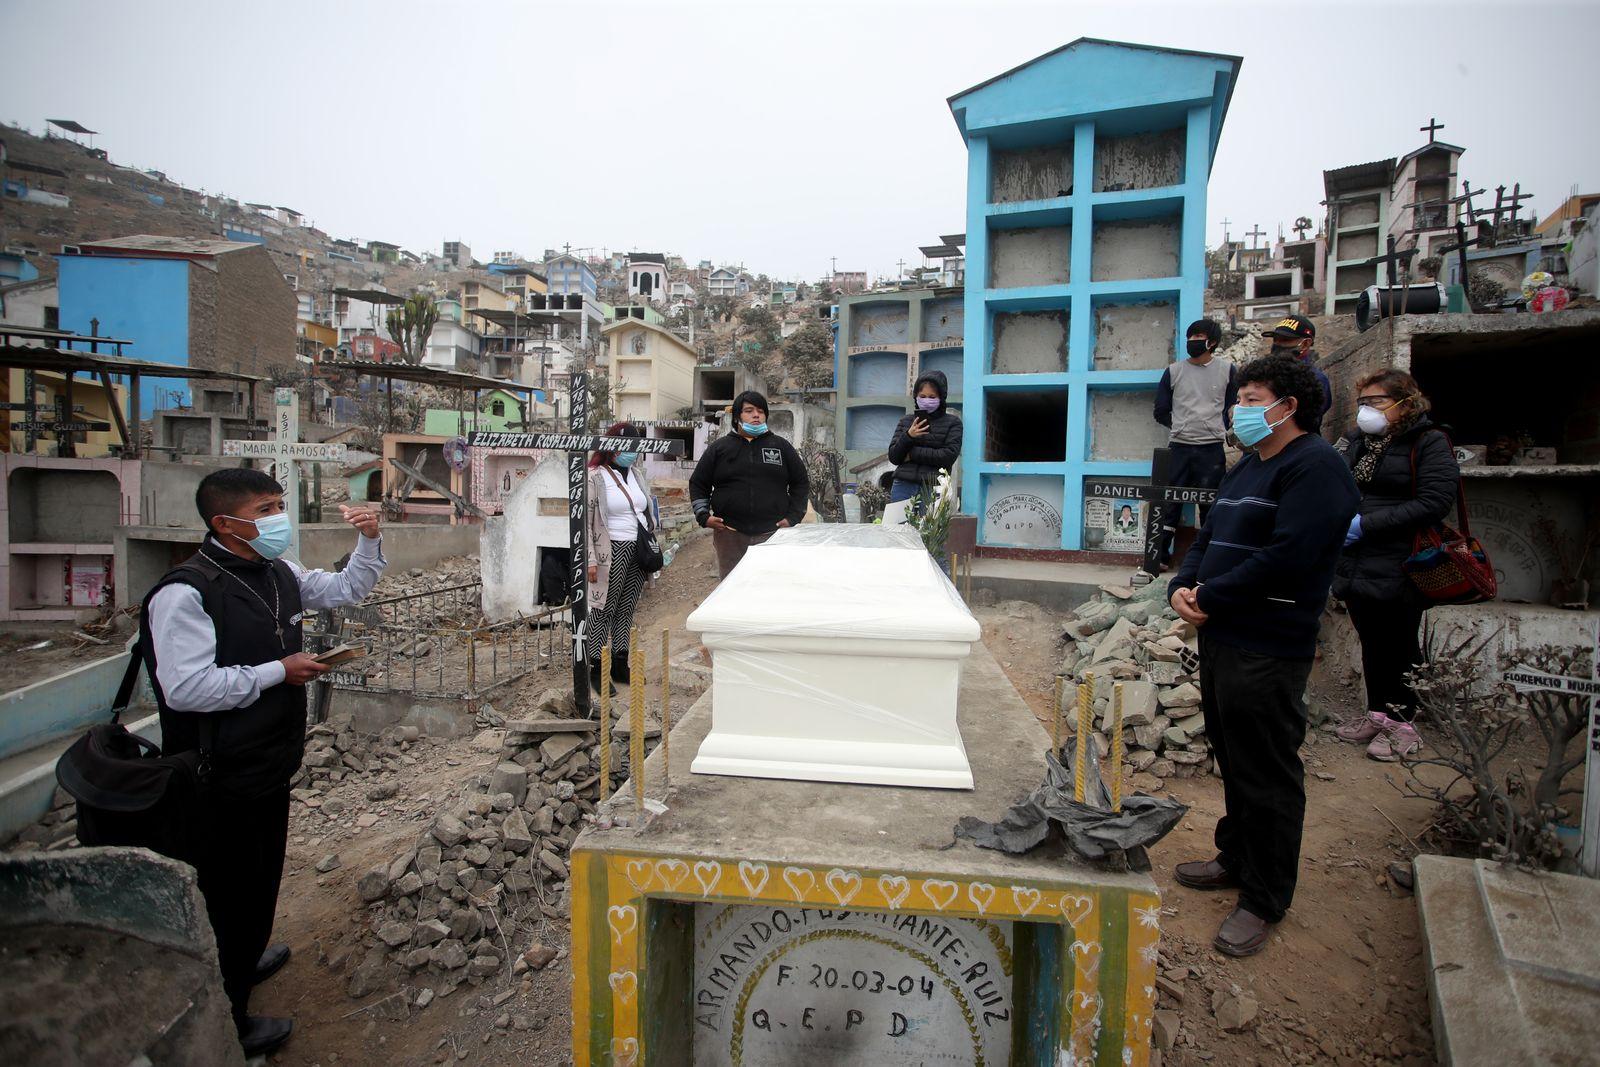 Burials of COVID-19 Victims at Nueva Esperanza Cemetery